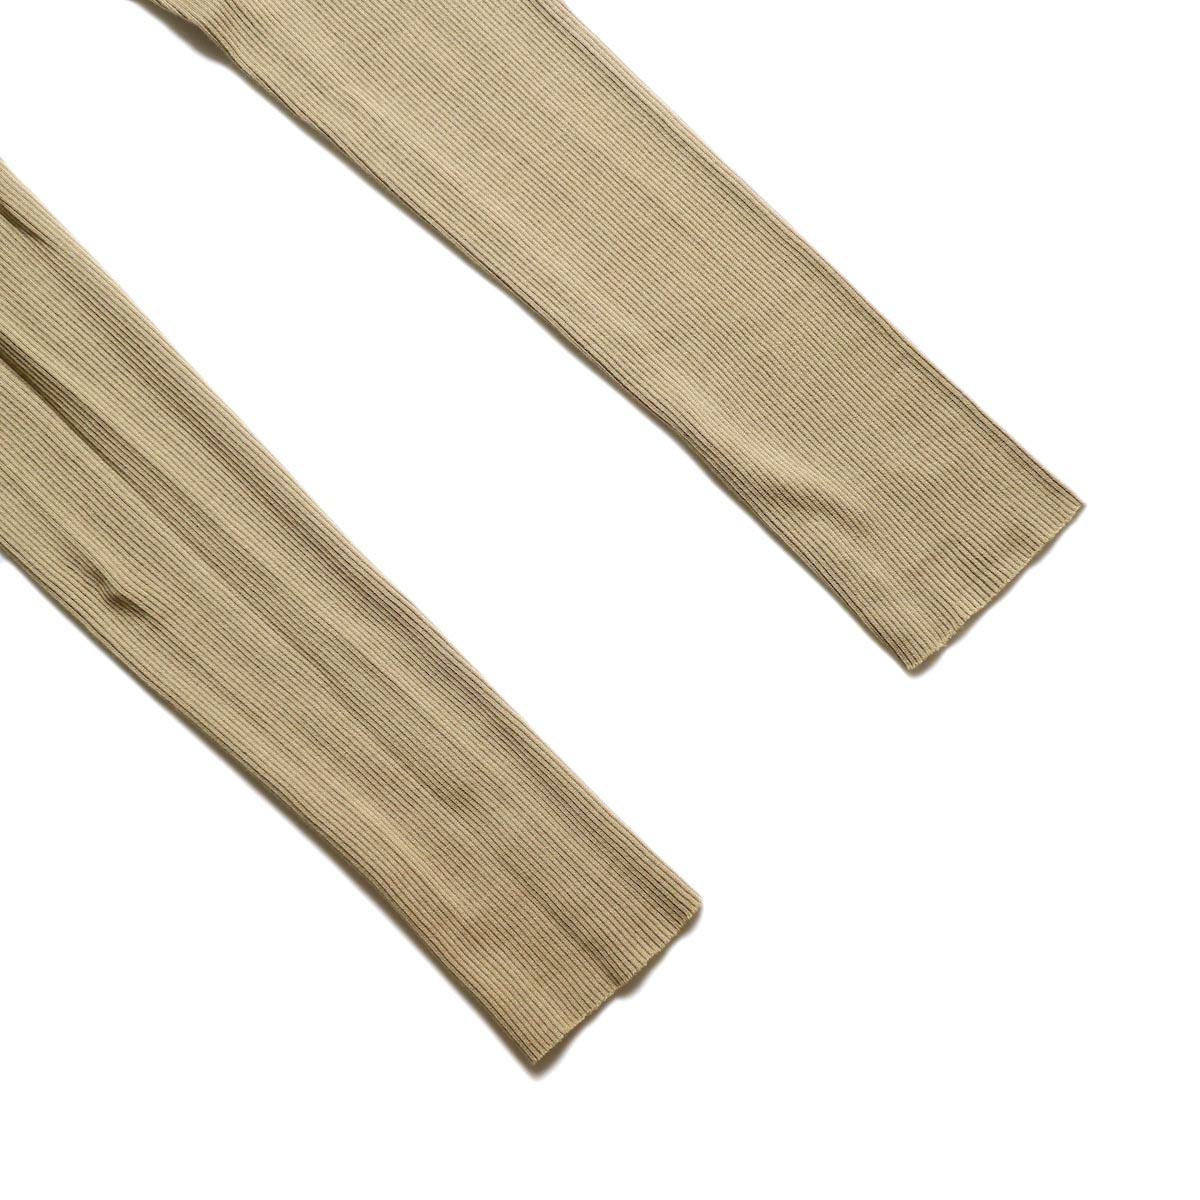 blurhms / Cotton High Stretch Rib Leggings (Beige)裾